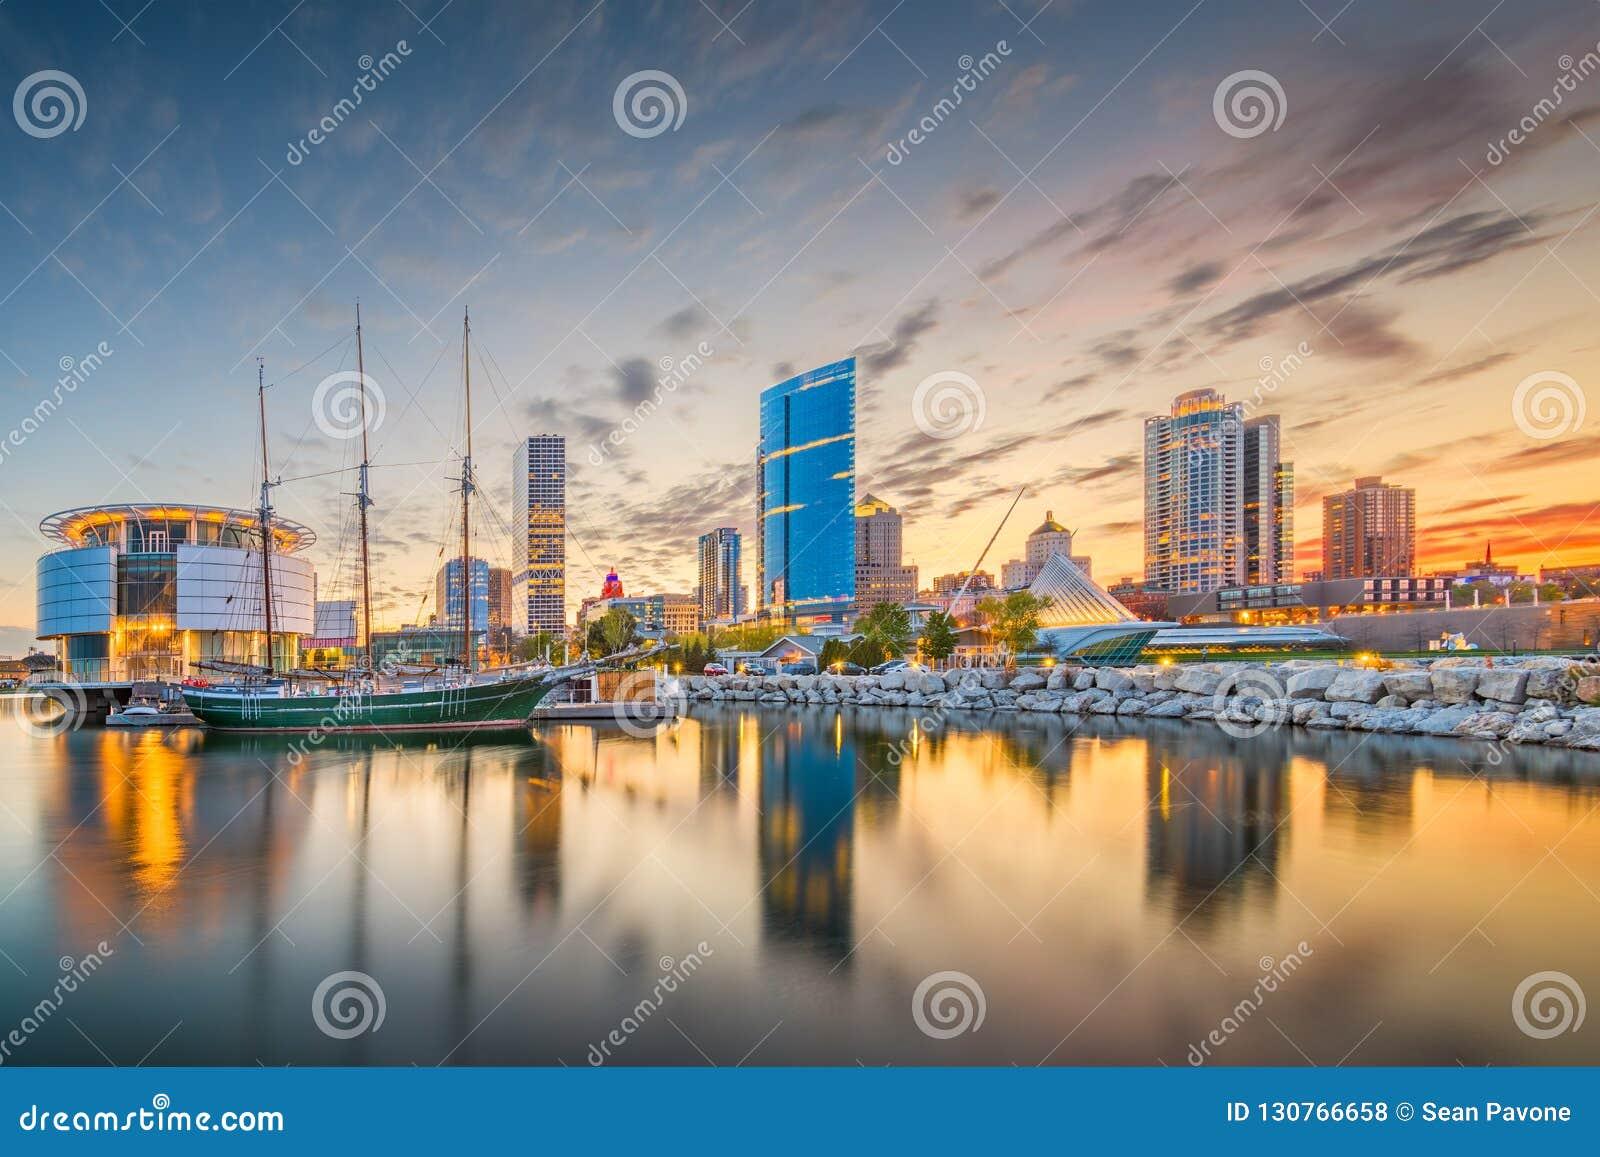 Milwaukee, Wisconsin, USA downtown city skyline on Lake Michigan